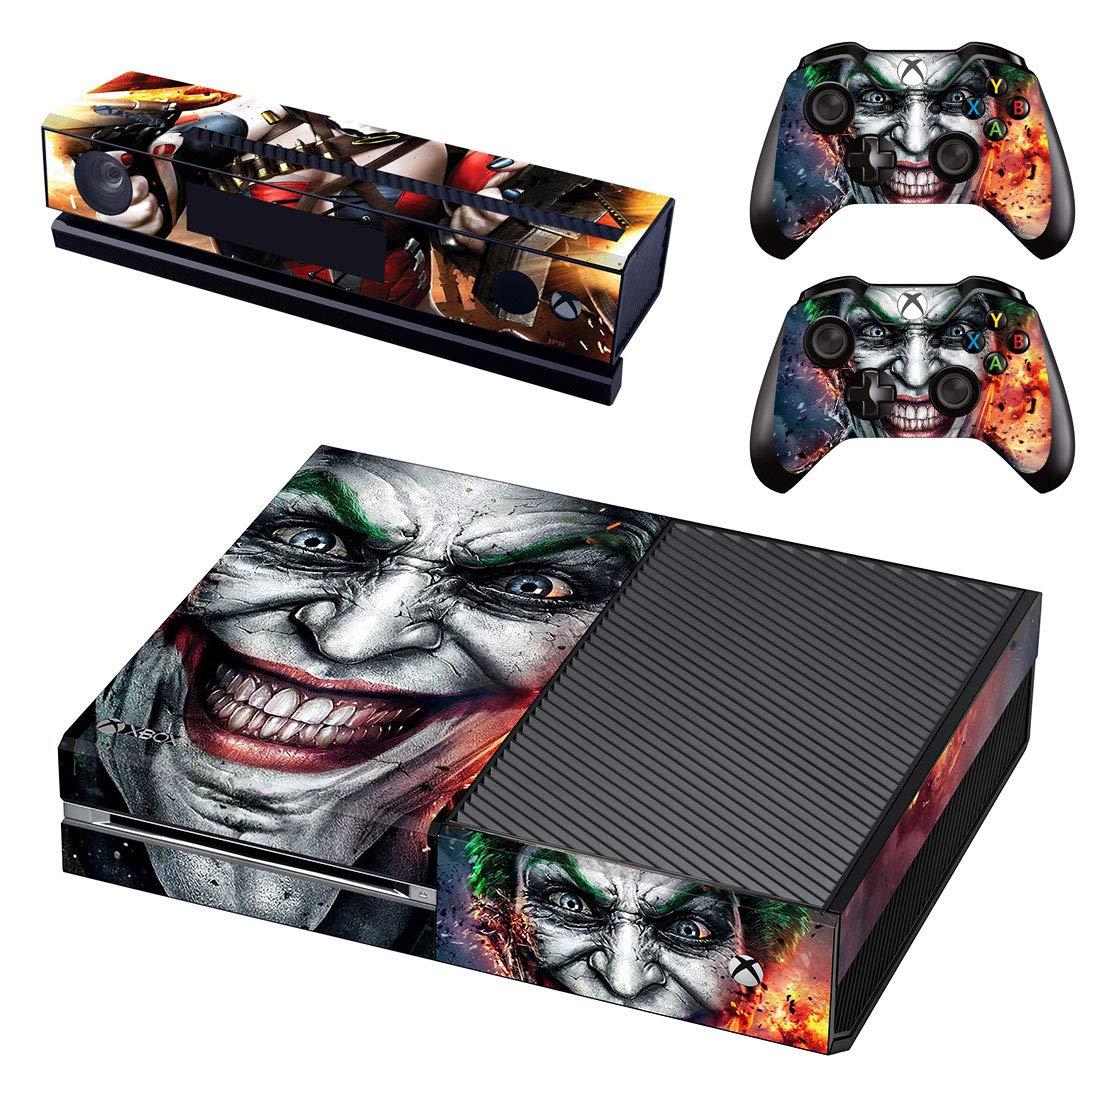 Adventure Games - XBOX ONE ORIGINAL - Joker, Harley Quinn - Playstation 4 Vinyl Console Skin Decal Sticker + 2 Controller Skins Set